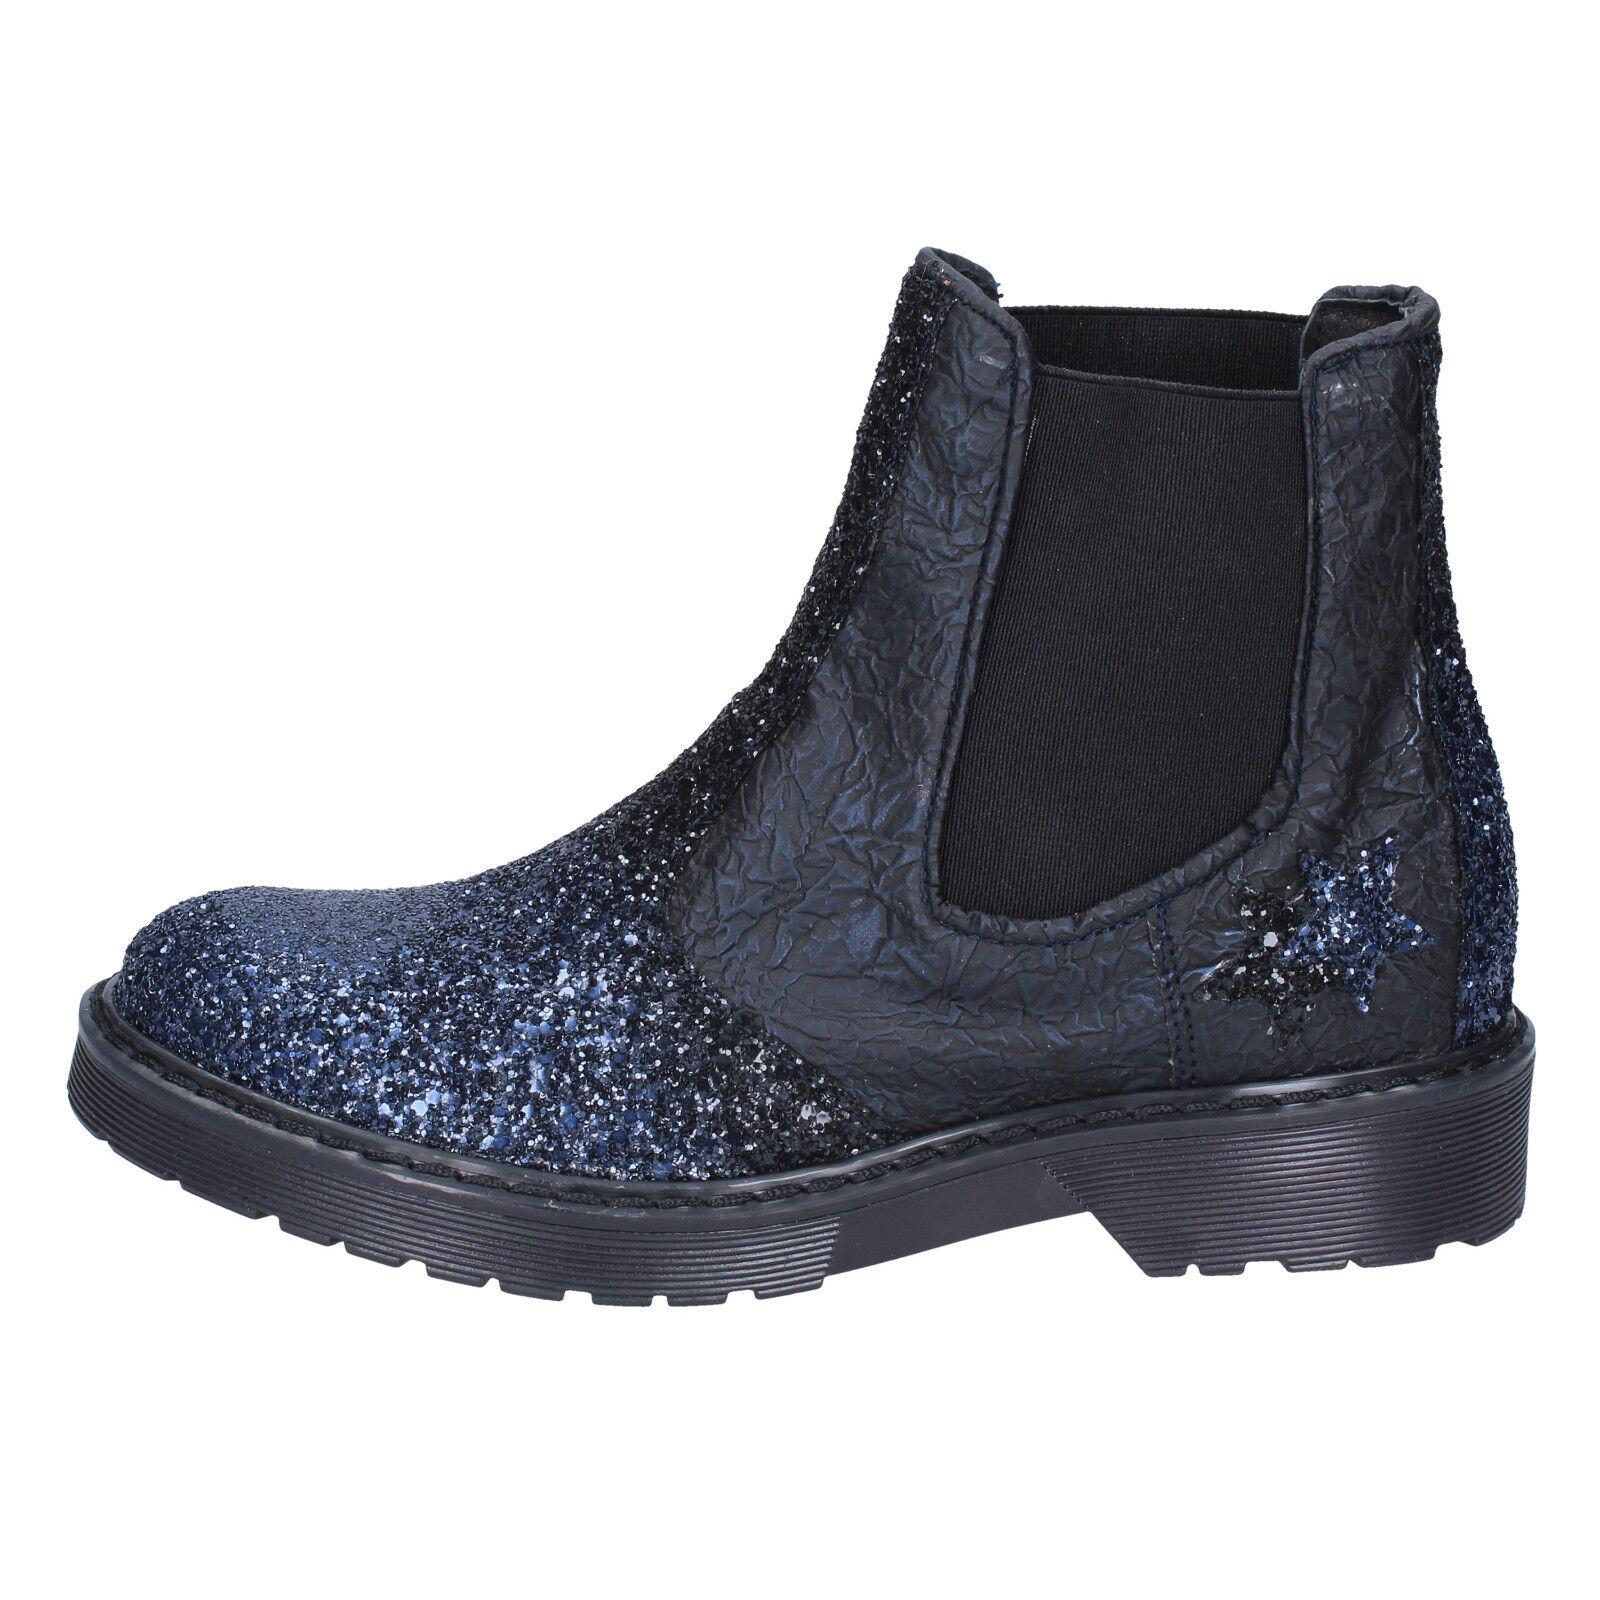 scarpe donna 2 nero STAR 38 stivaletti blu nero 2 glitter pelle tessuto BX375-38 9ae84a